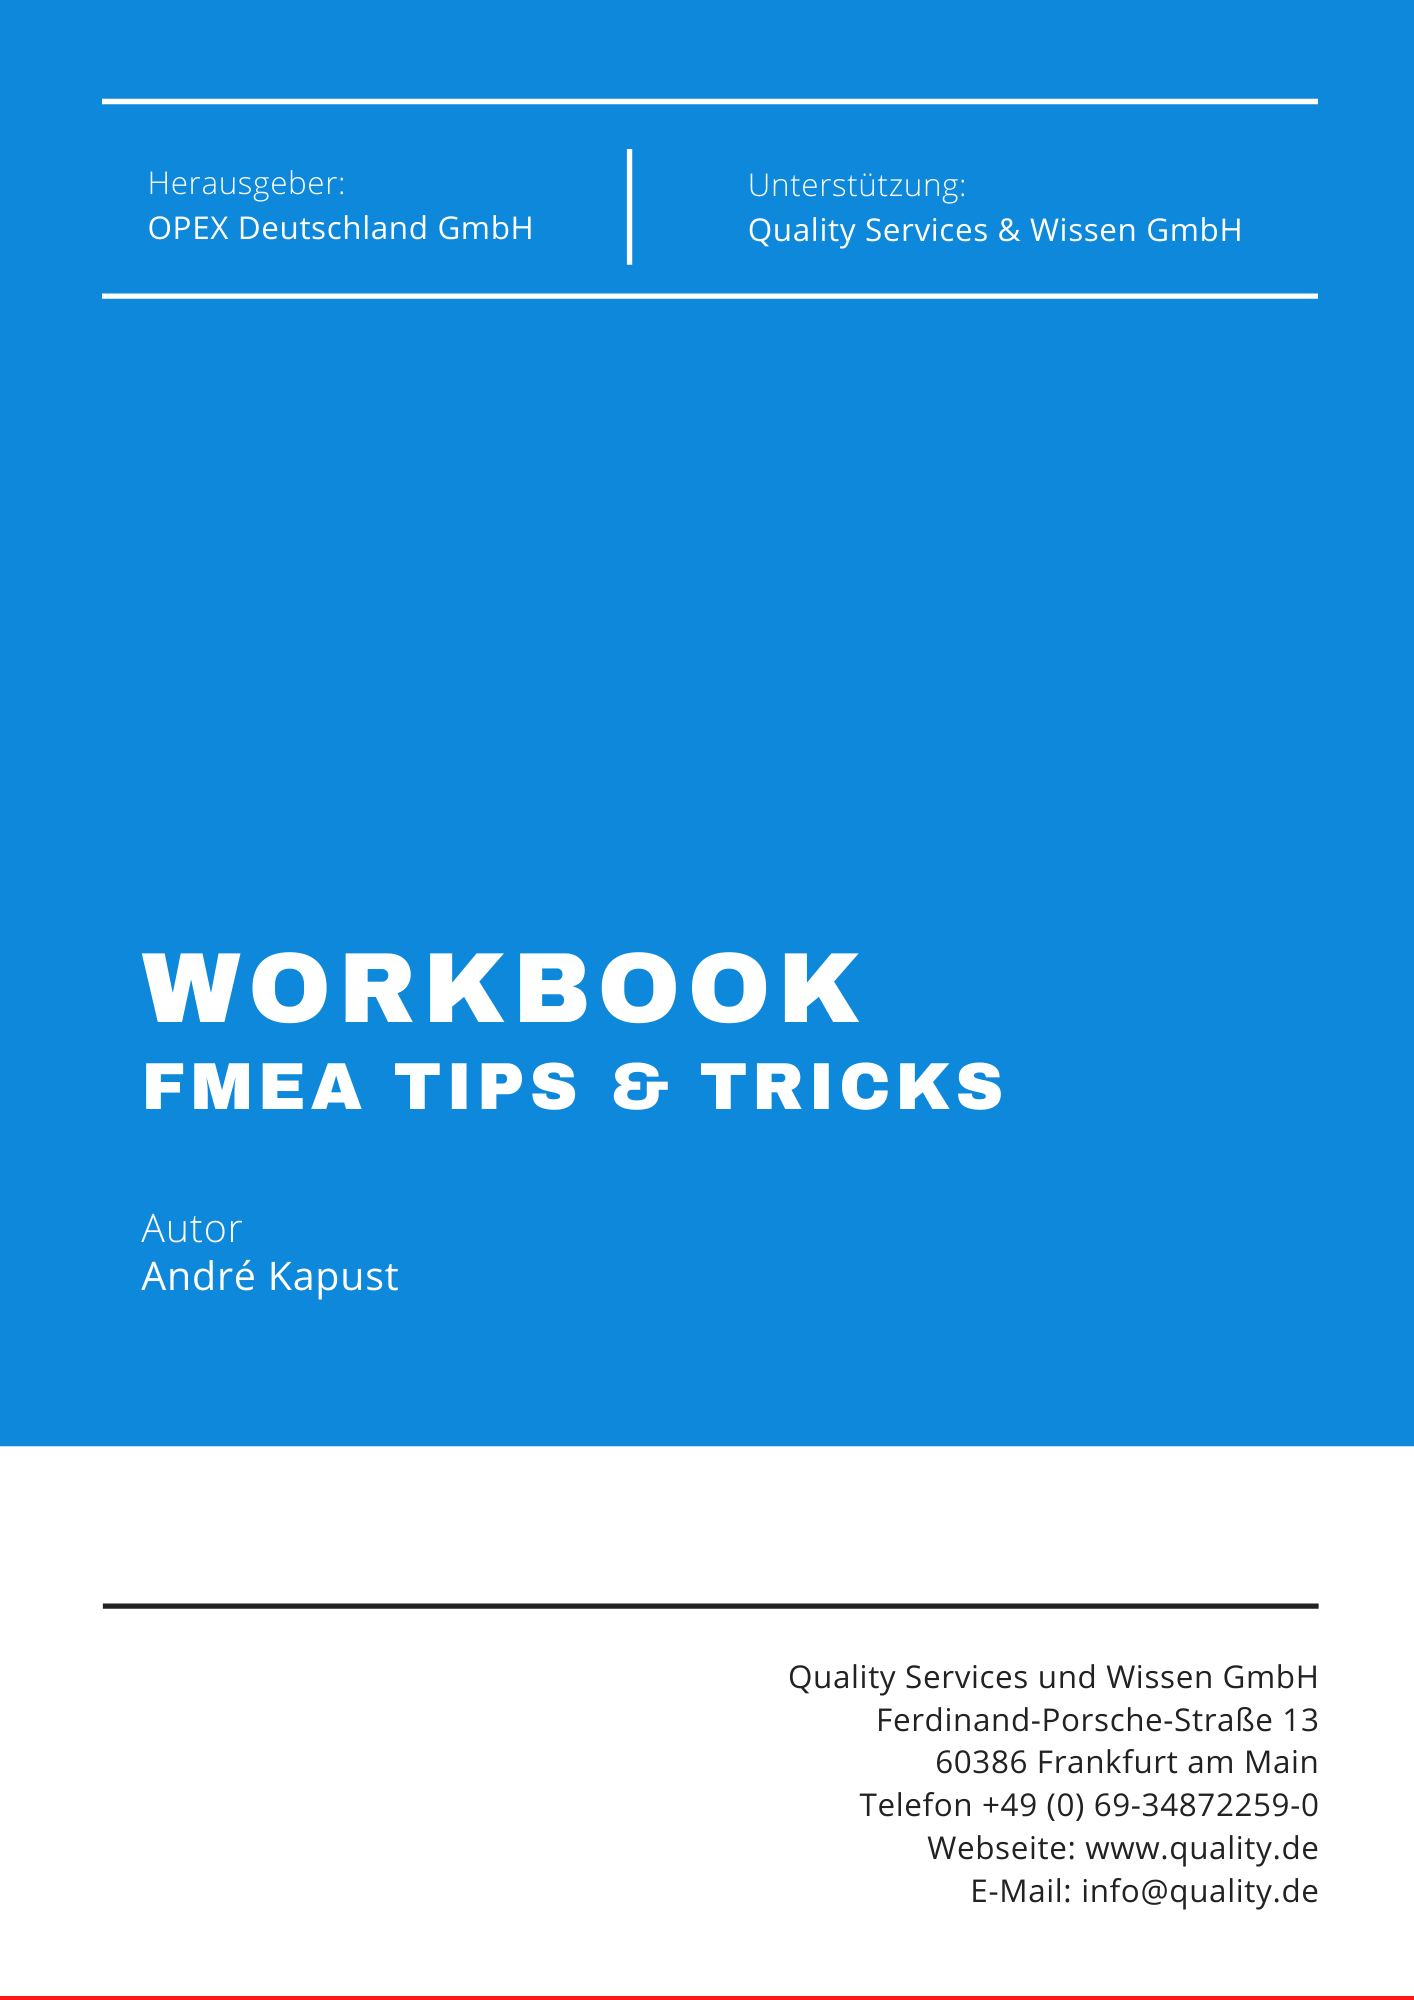 FMEA Workbook Tips & Tricks